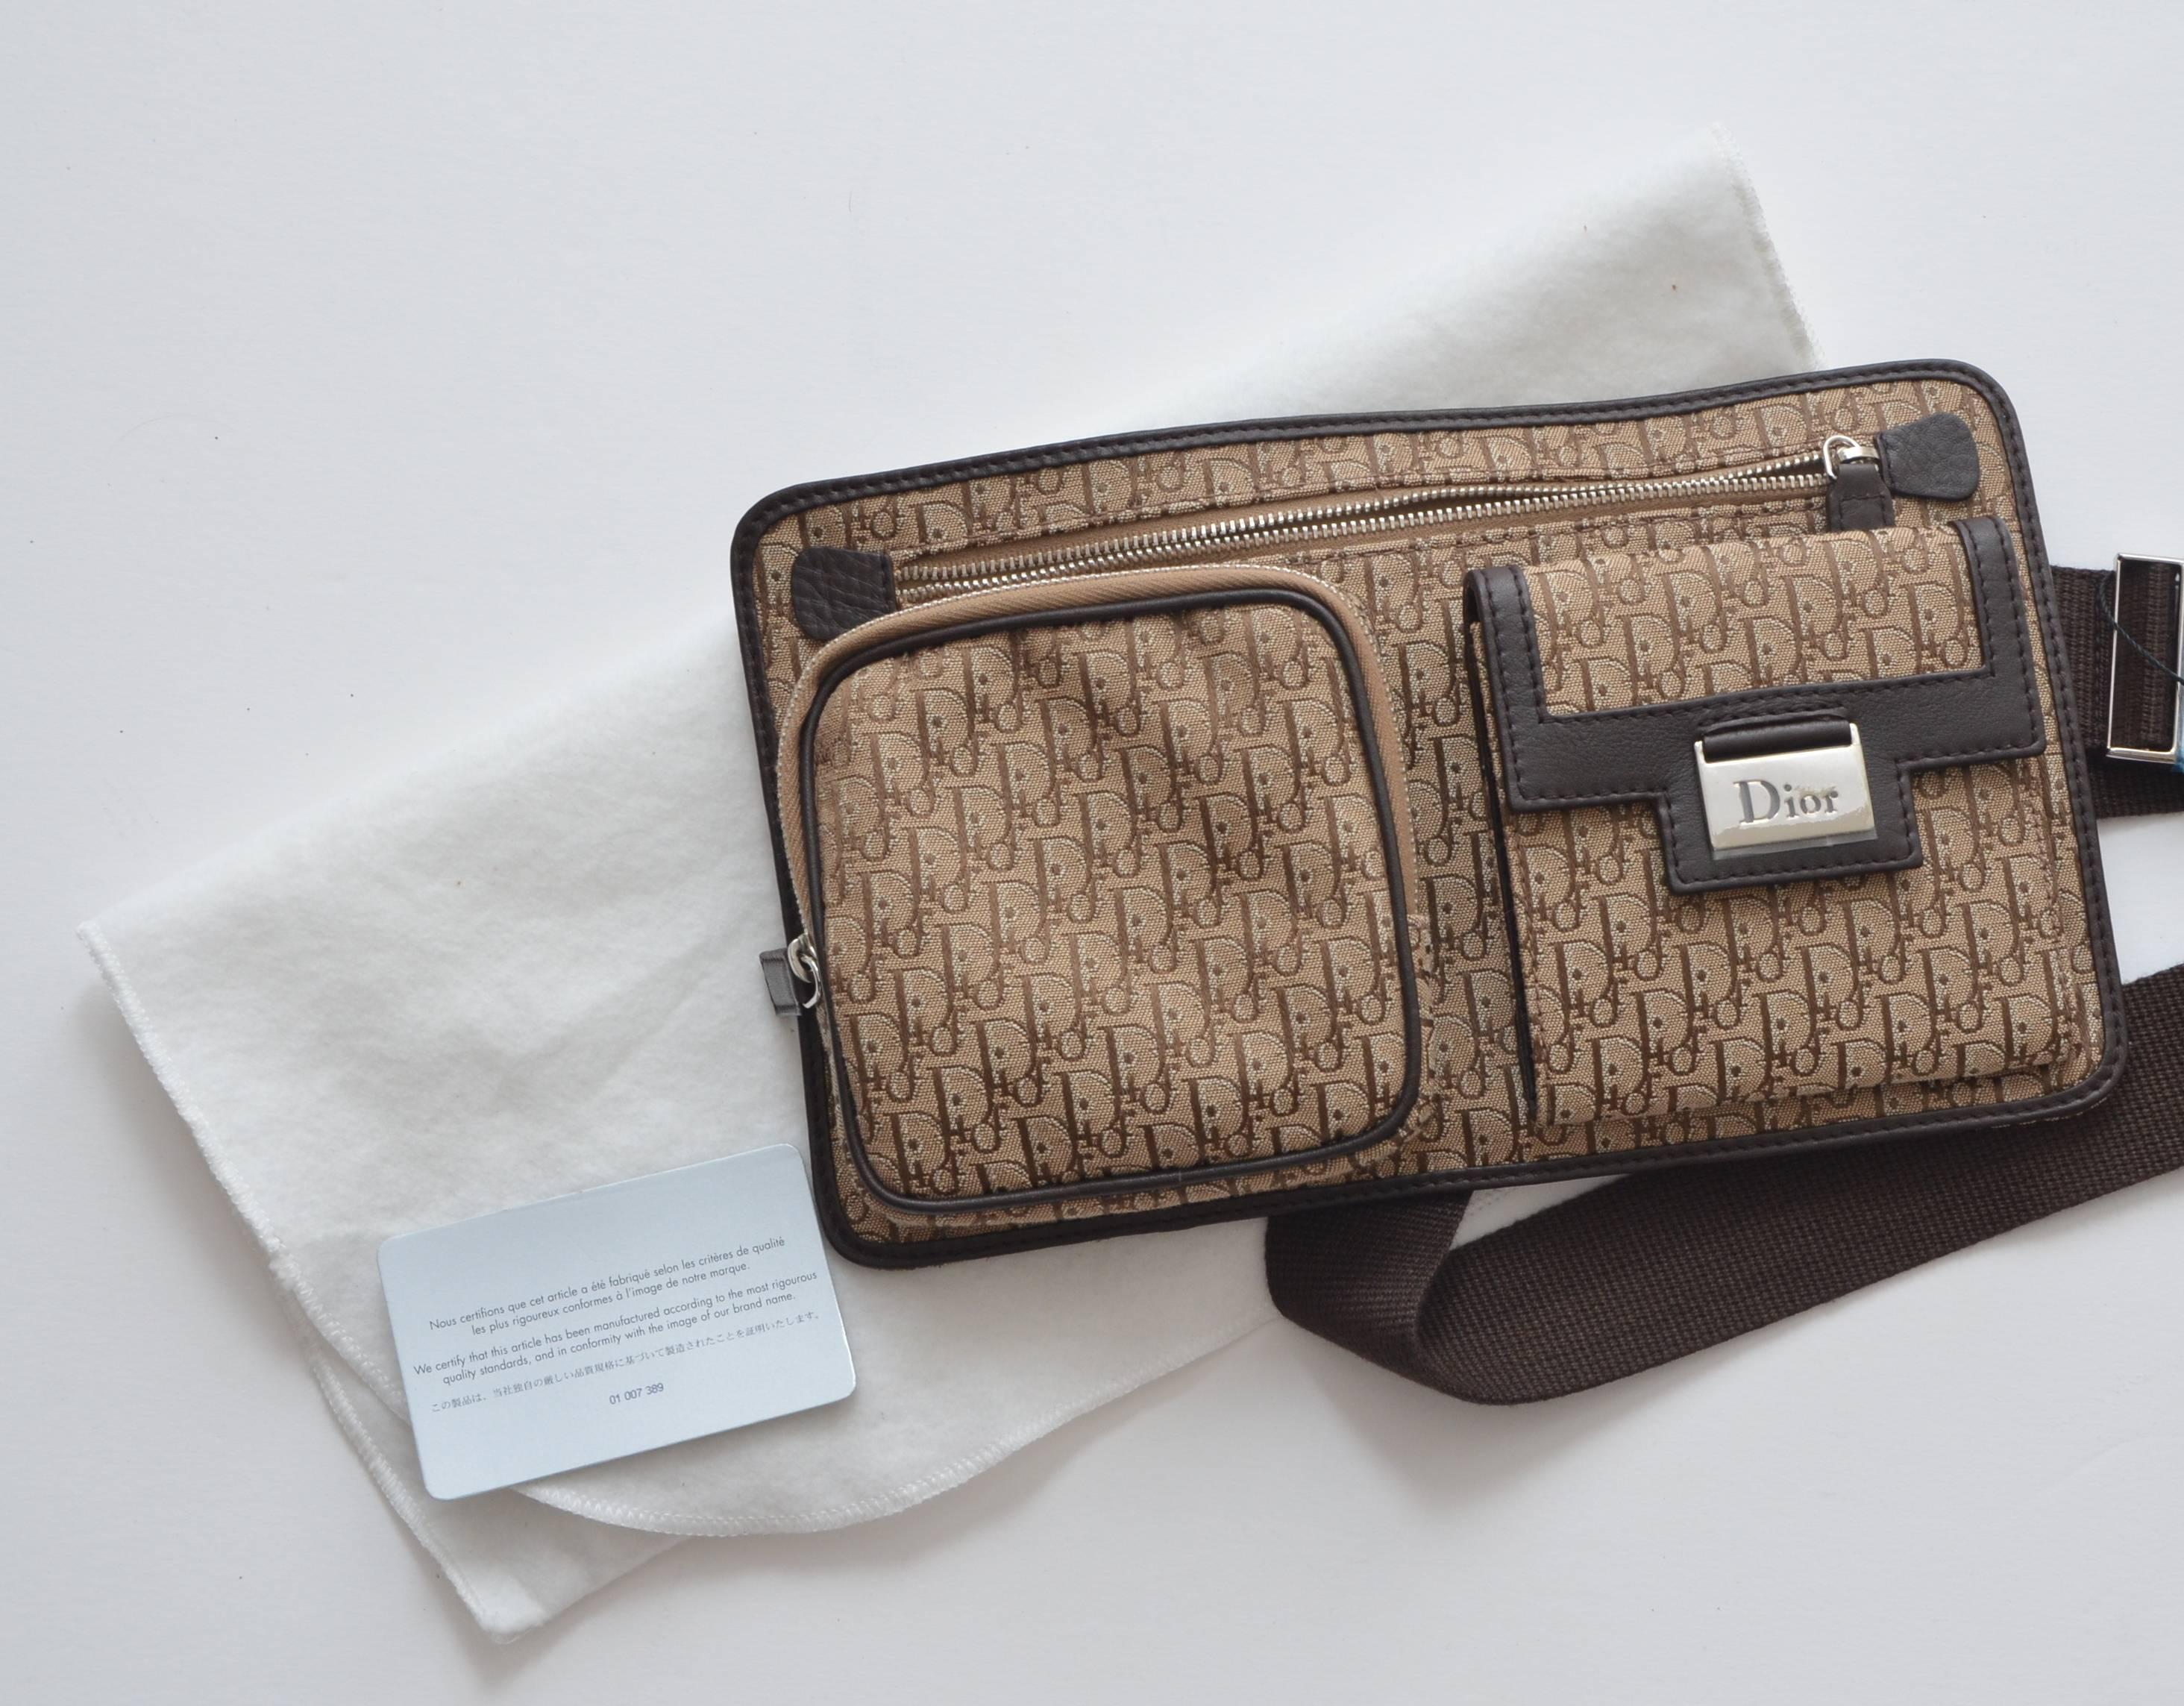 1stdibs Louis Vuitton Monogram Canvas Gm Plis Bag Large Size Sold Out zg6AqdkagU